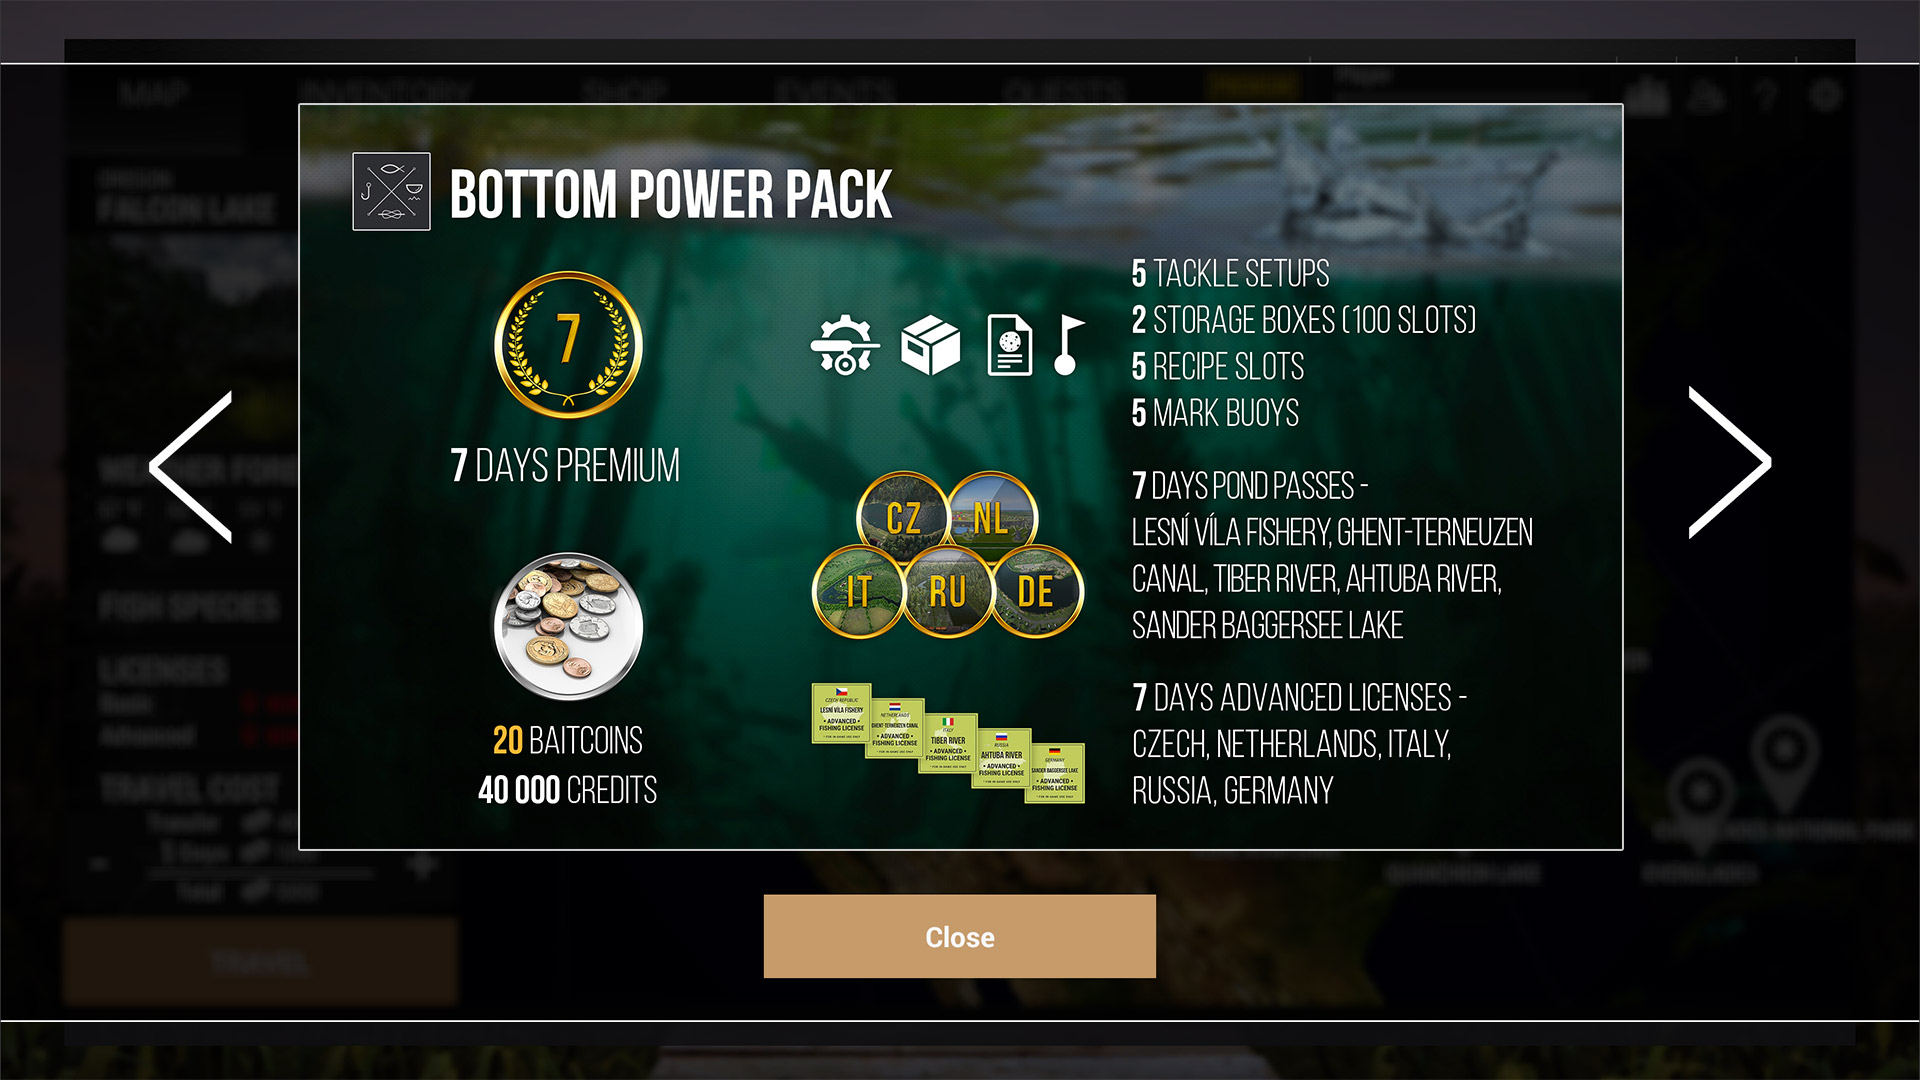 Fishing Planet: Bottom Power Pack